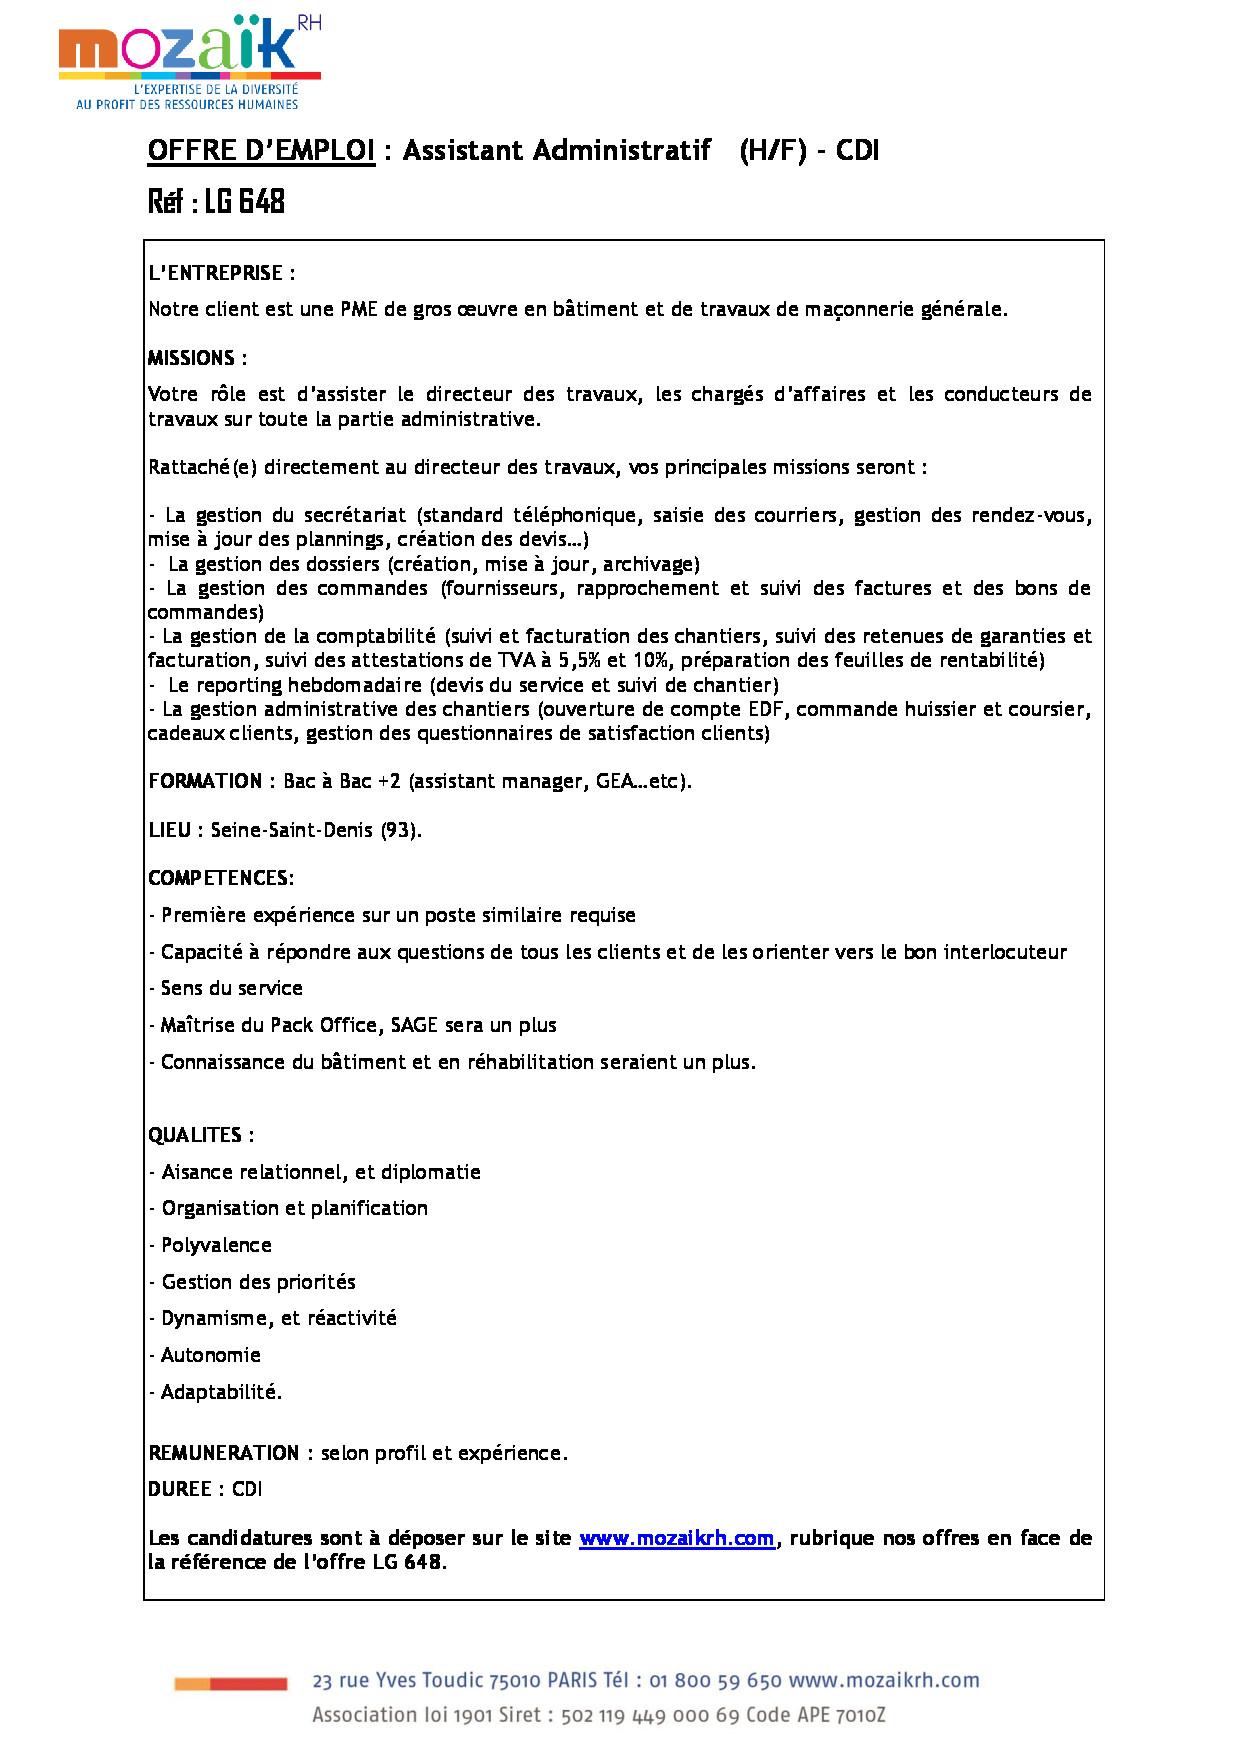 FDP Assistante Administrative